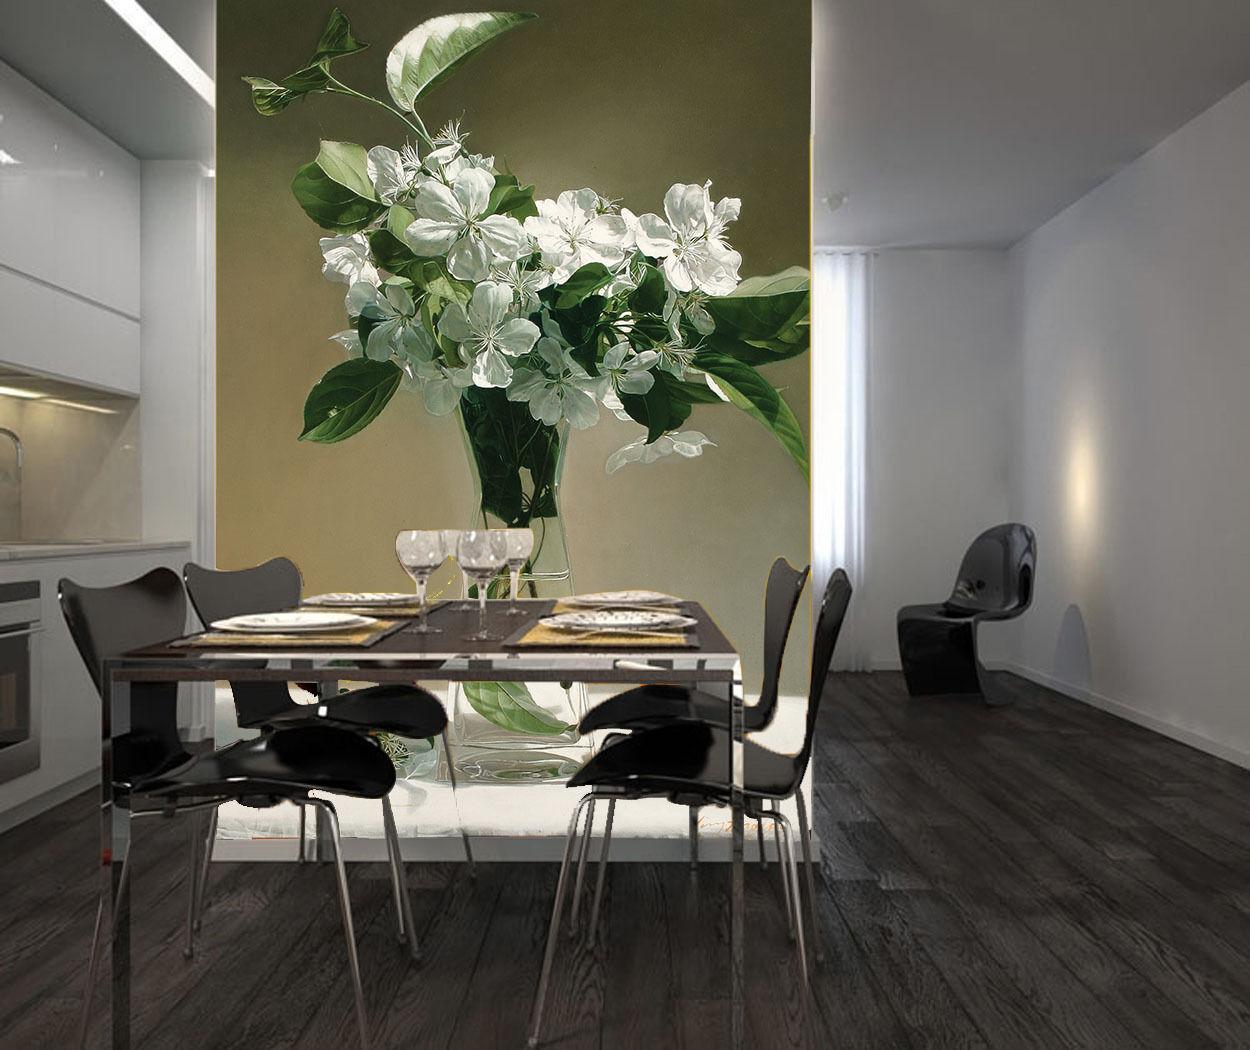 3D Vase von weißen Blaumen 2 Fototapeten Wandbild Fototapete BildTapete FamilieDE